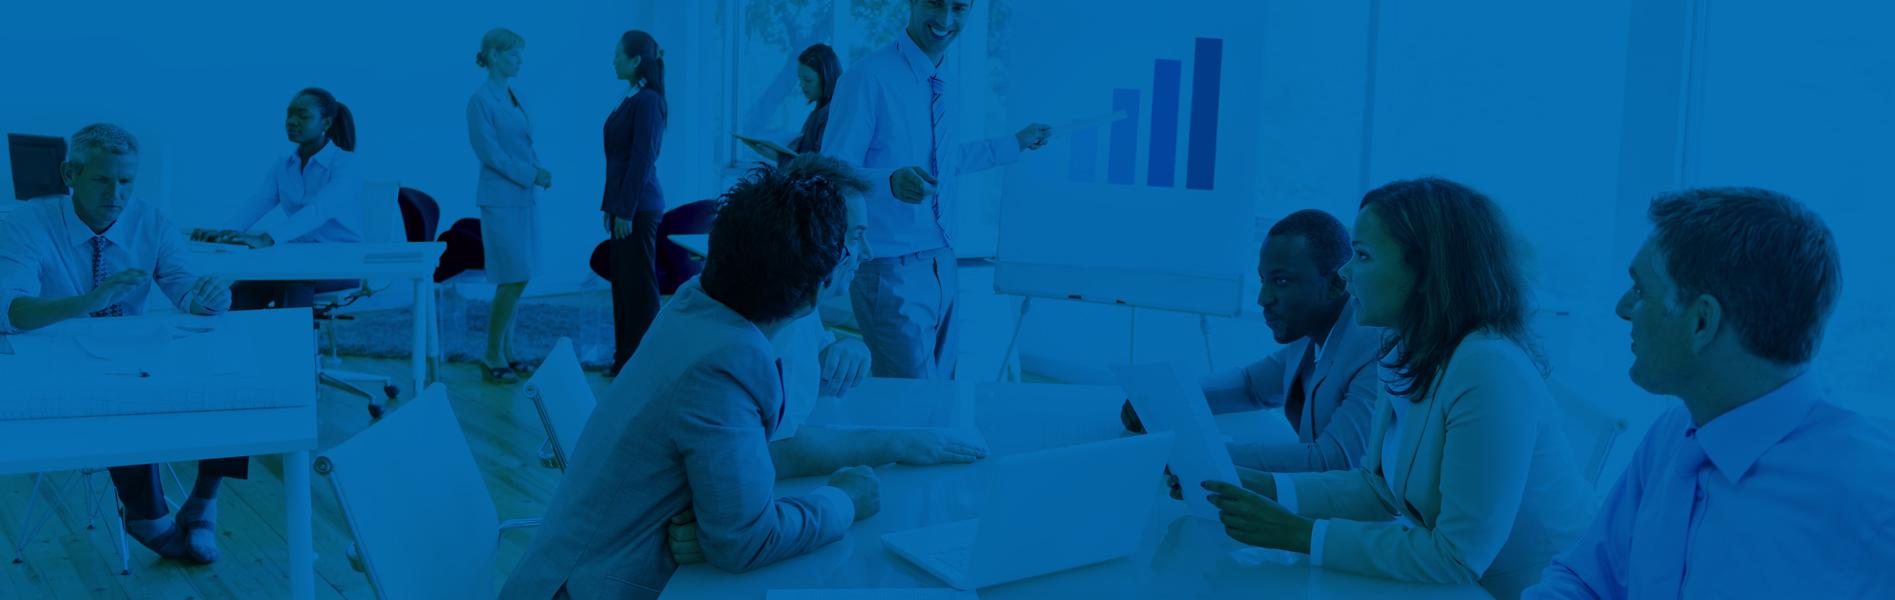 Develop-a-Marketing-Plan-Shelton-Associates-Sheffield